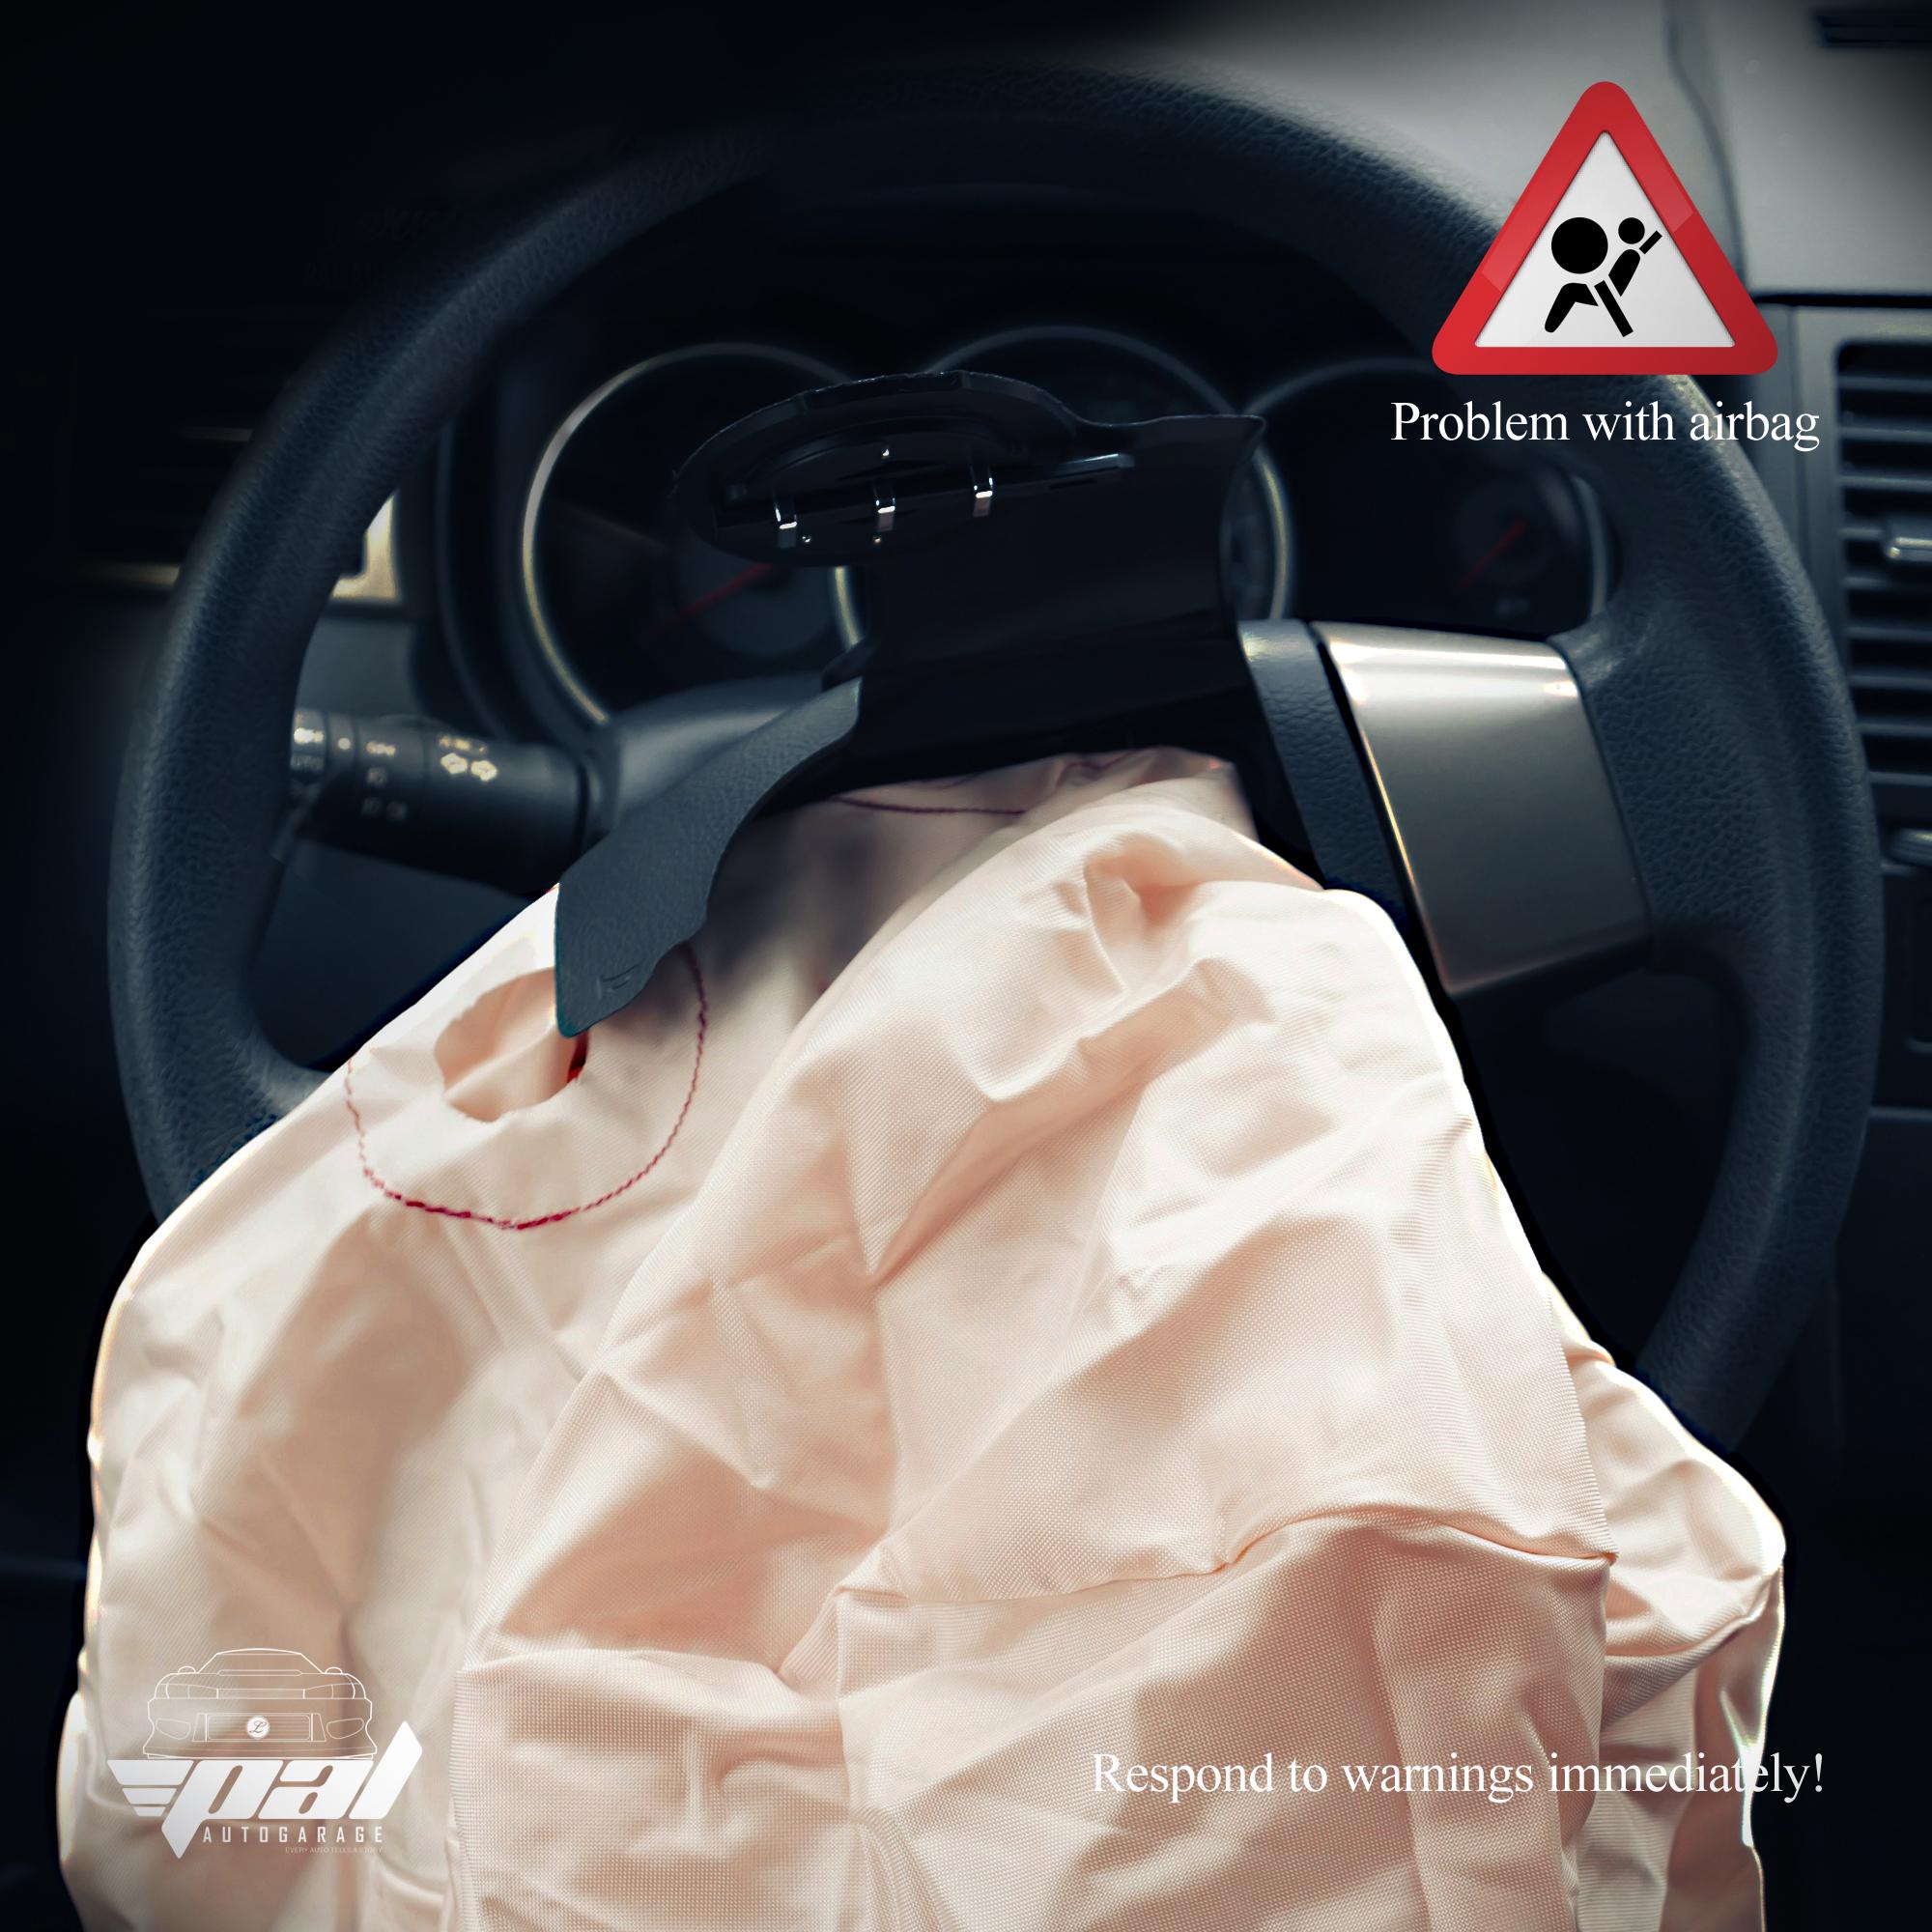 Airbag Warning Light | Airbag Repair Dubai